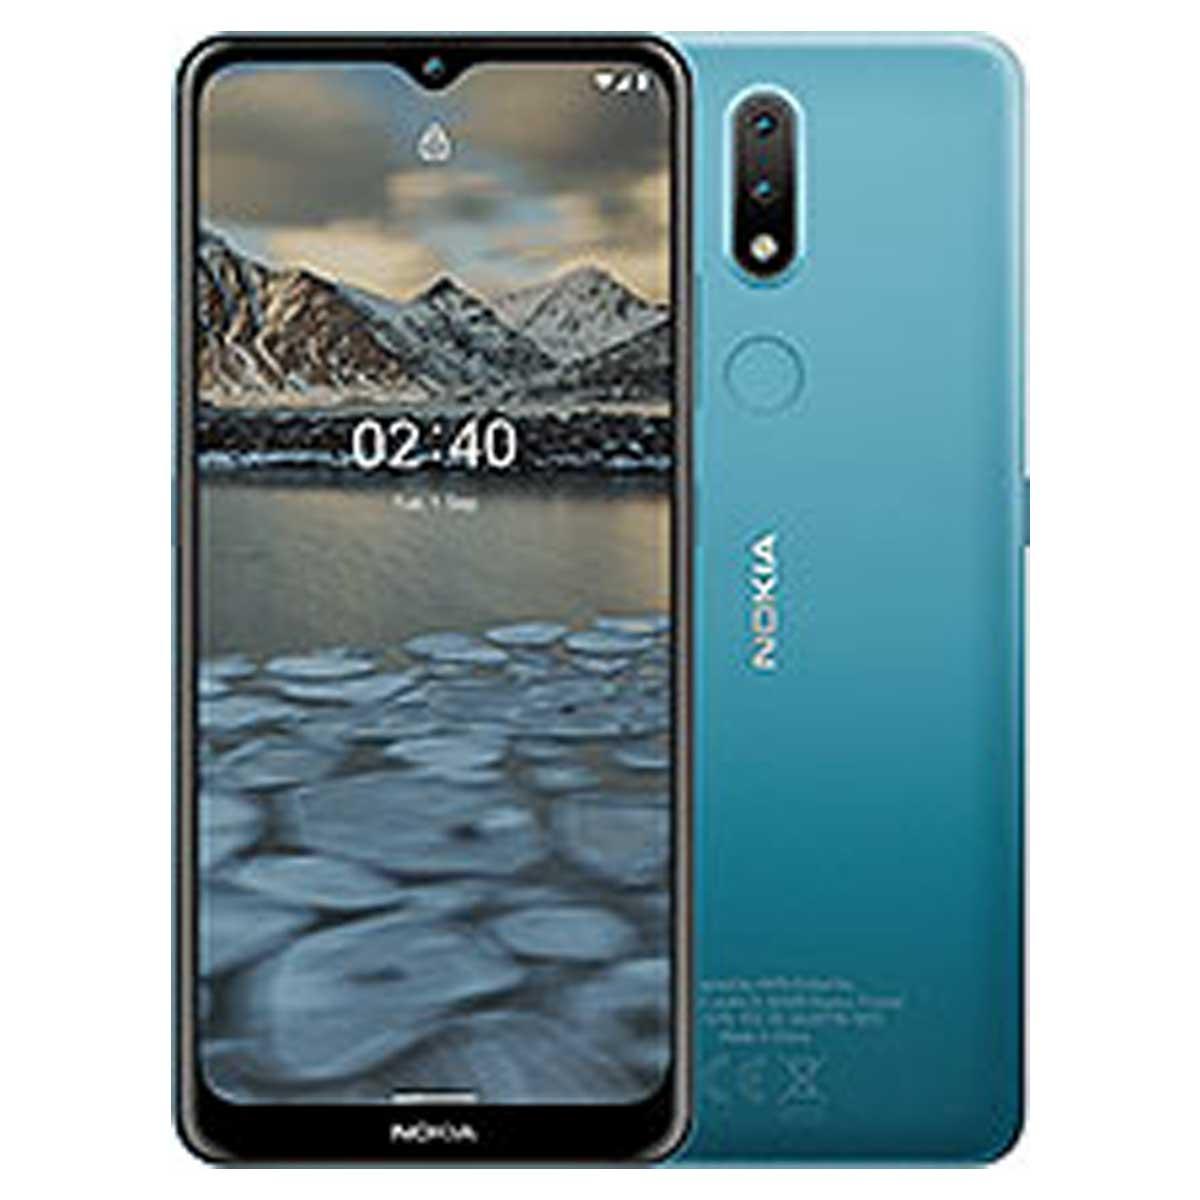 Nokia 2 4 Price In India Full Specs 17th January 2021 Digit